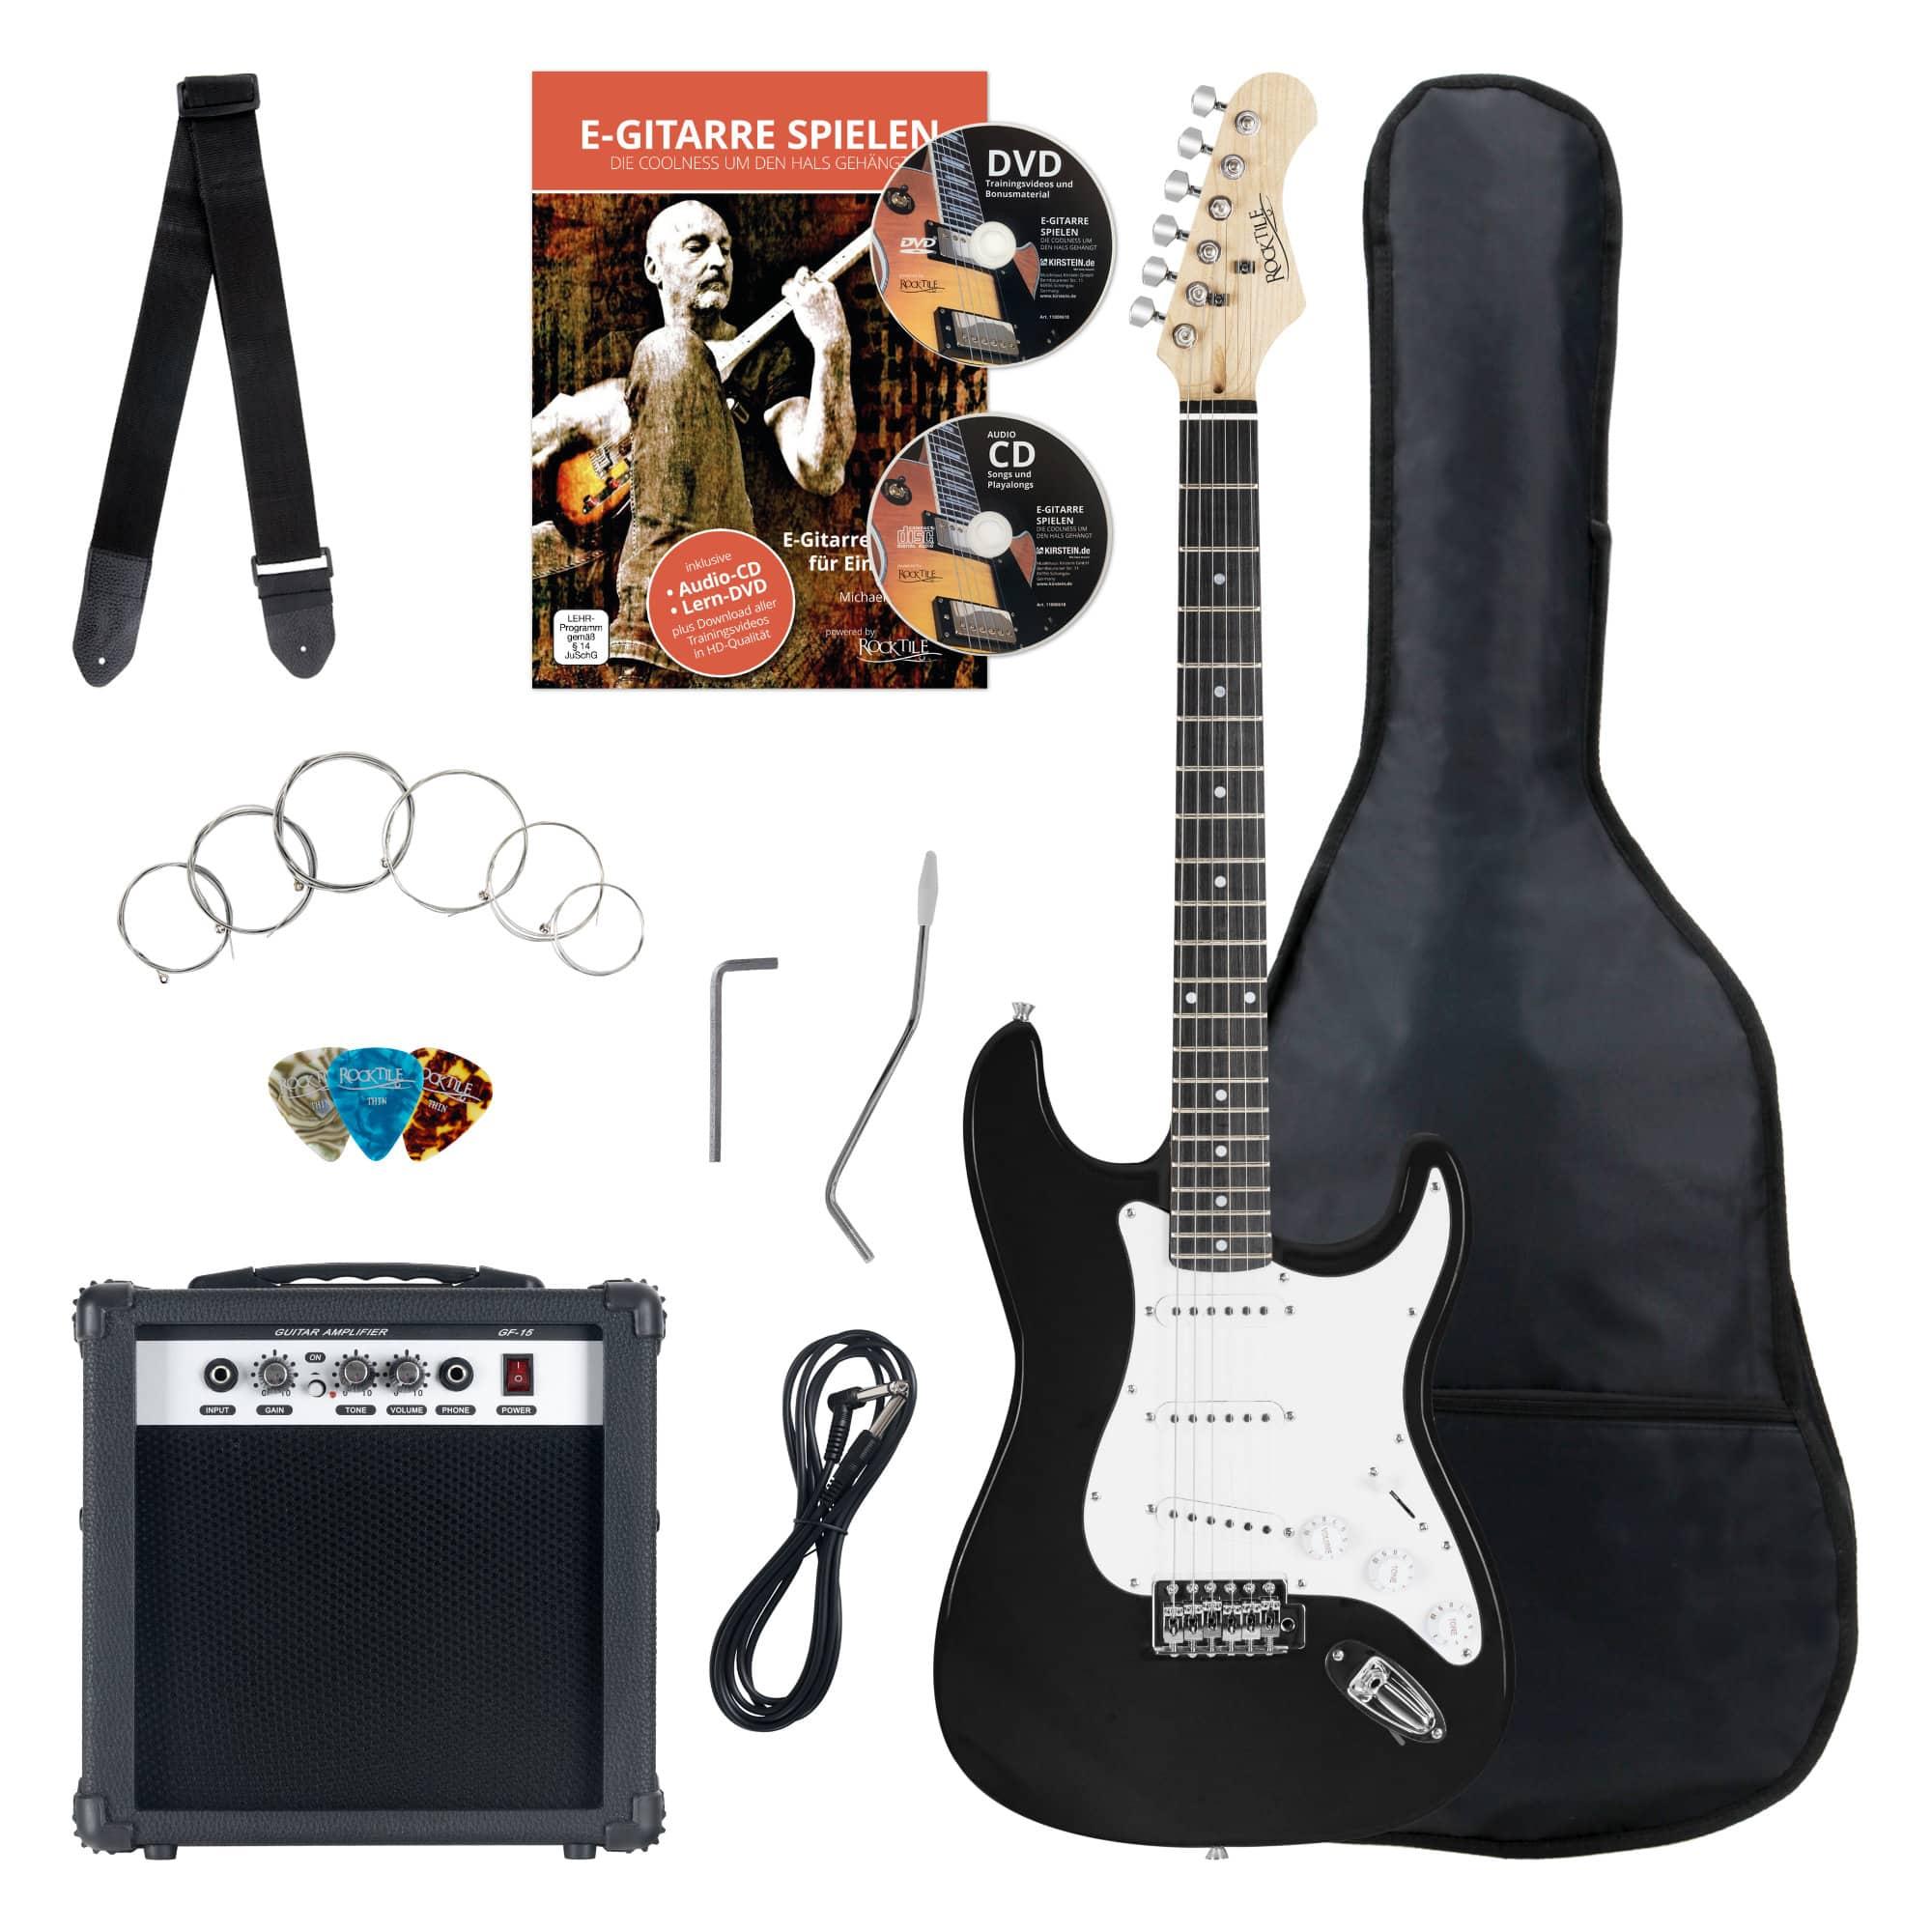 Egitarren - Rocktile Banger's Pack E Gitarren Set, 8 teilig Black Retoure (Zustand gut) - Onlineshop Musikhaus Kirstein